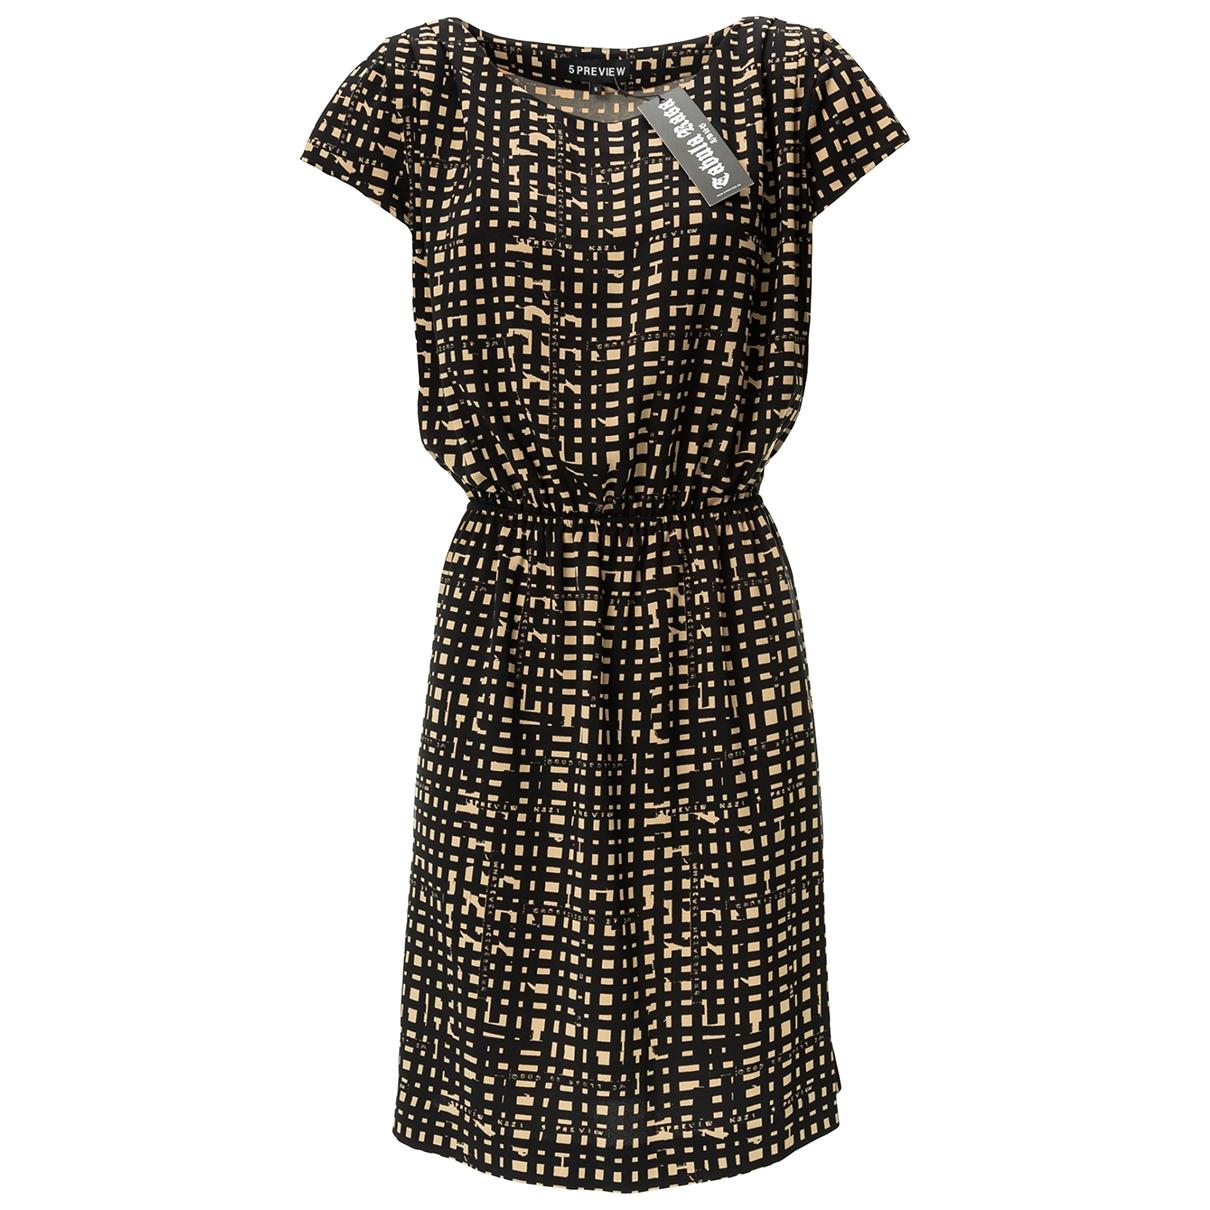 5 Preview \N Kleid in  Schwarz Polyester